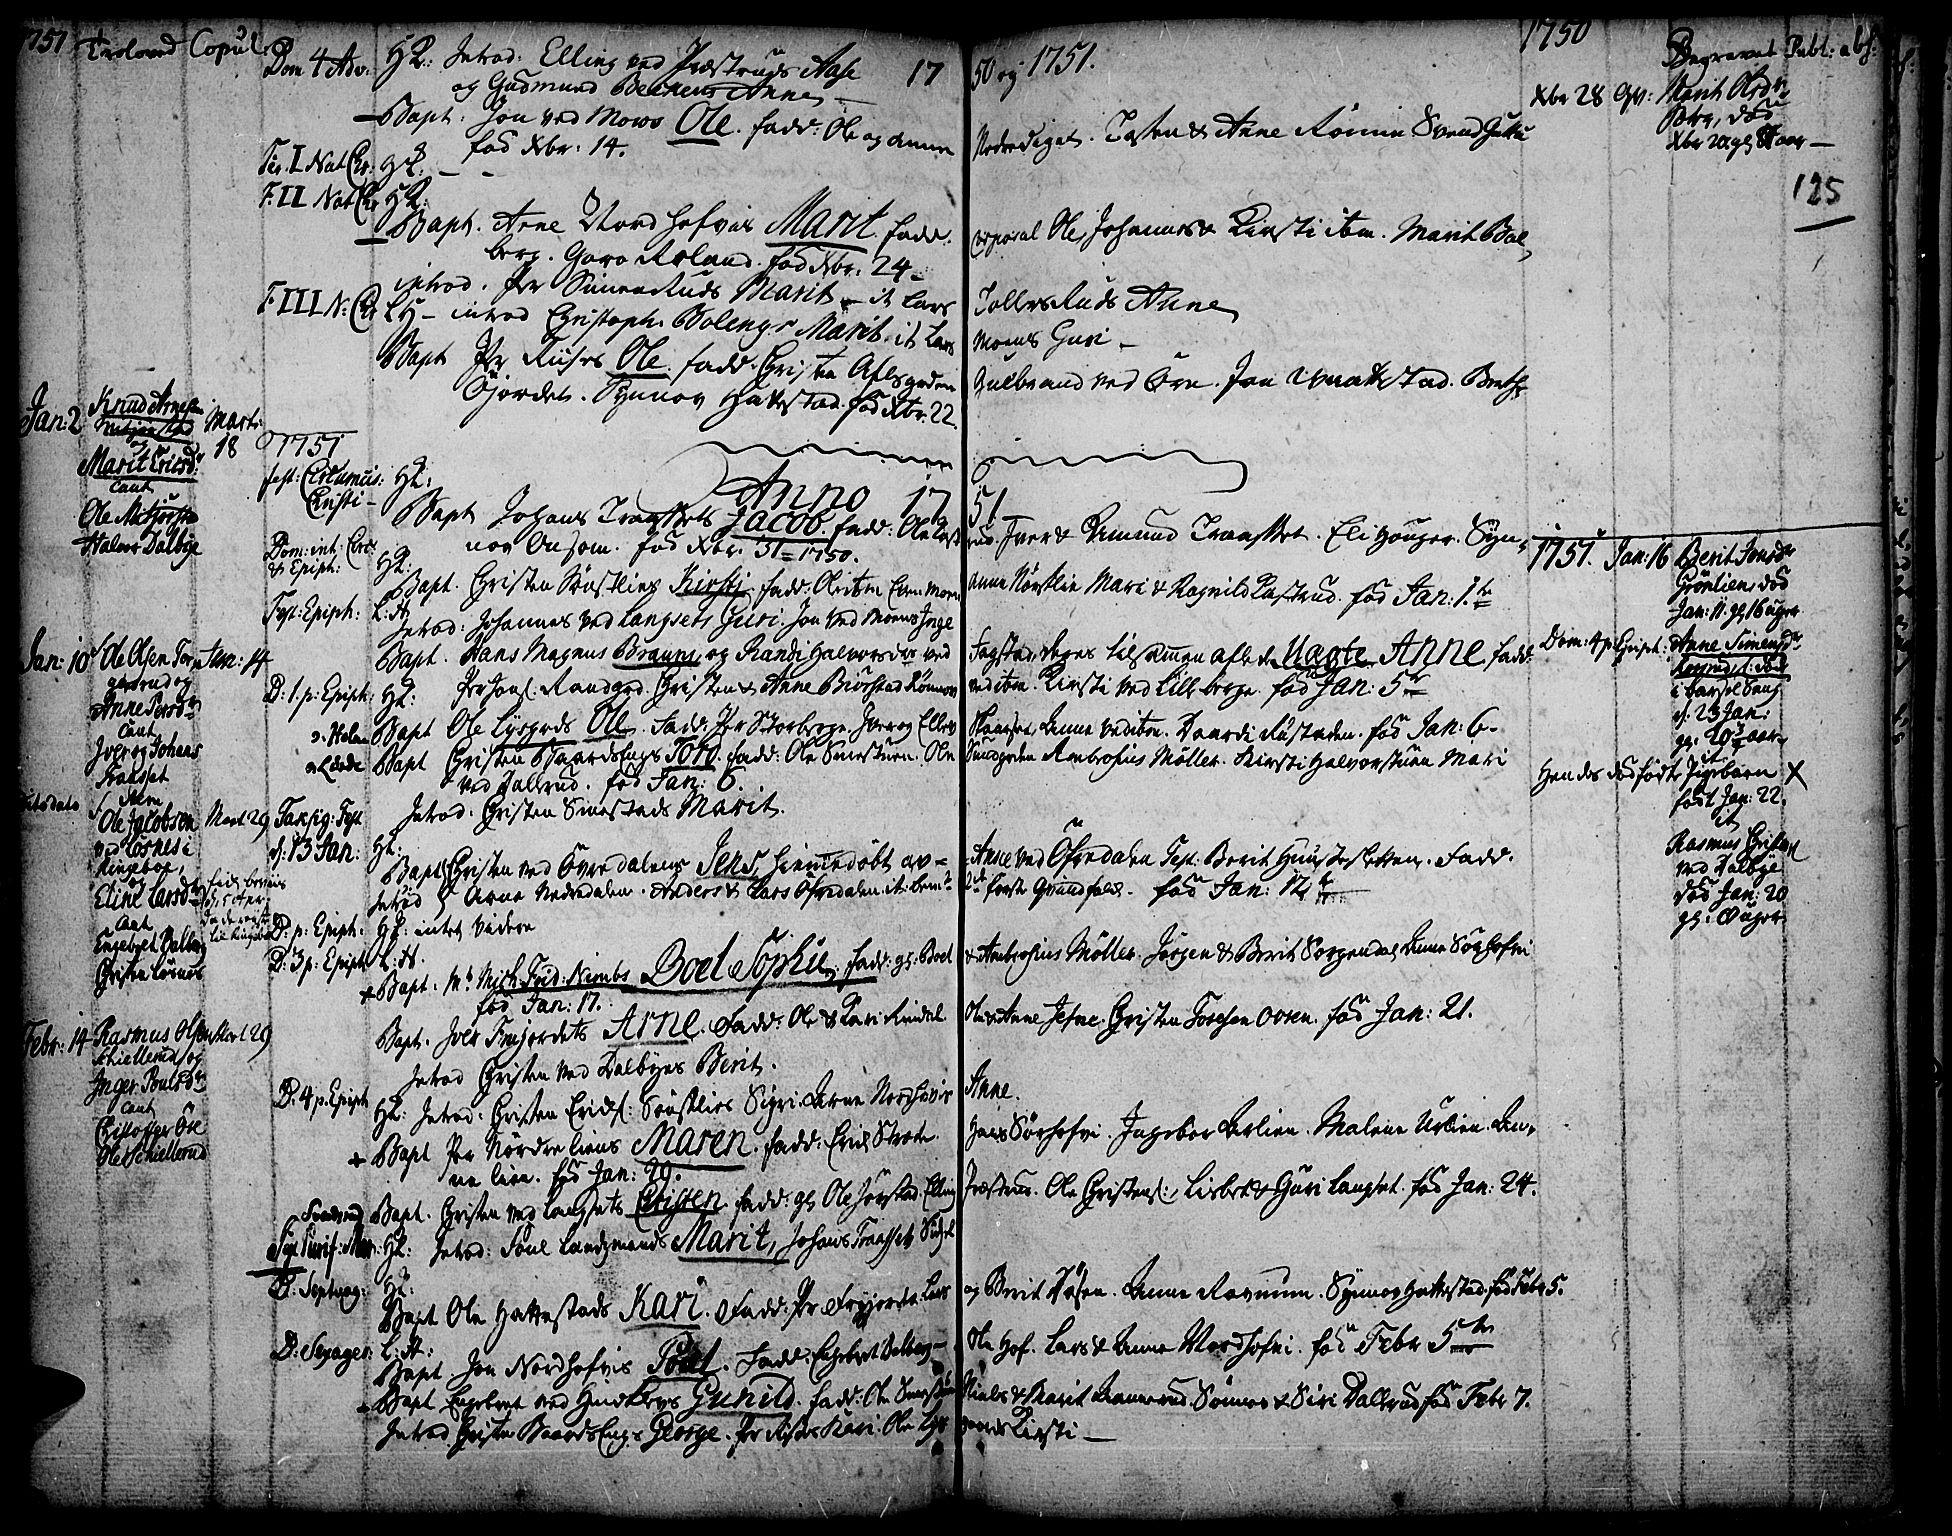 SAH, Fåberg prestekontor, Ministerialbok nr. 1, 1727-1775, s. 125